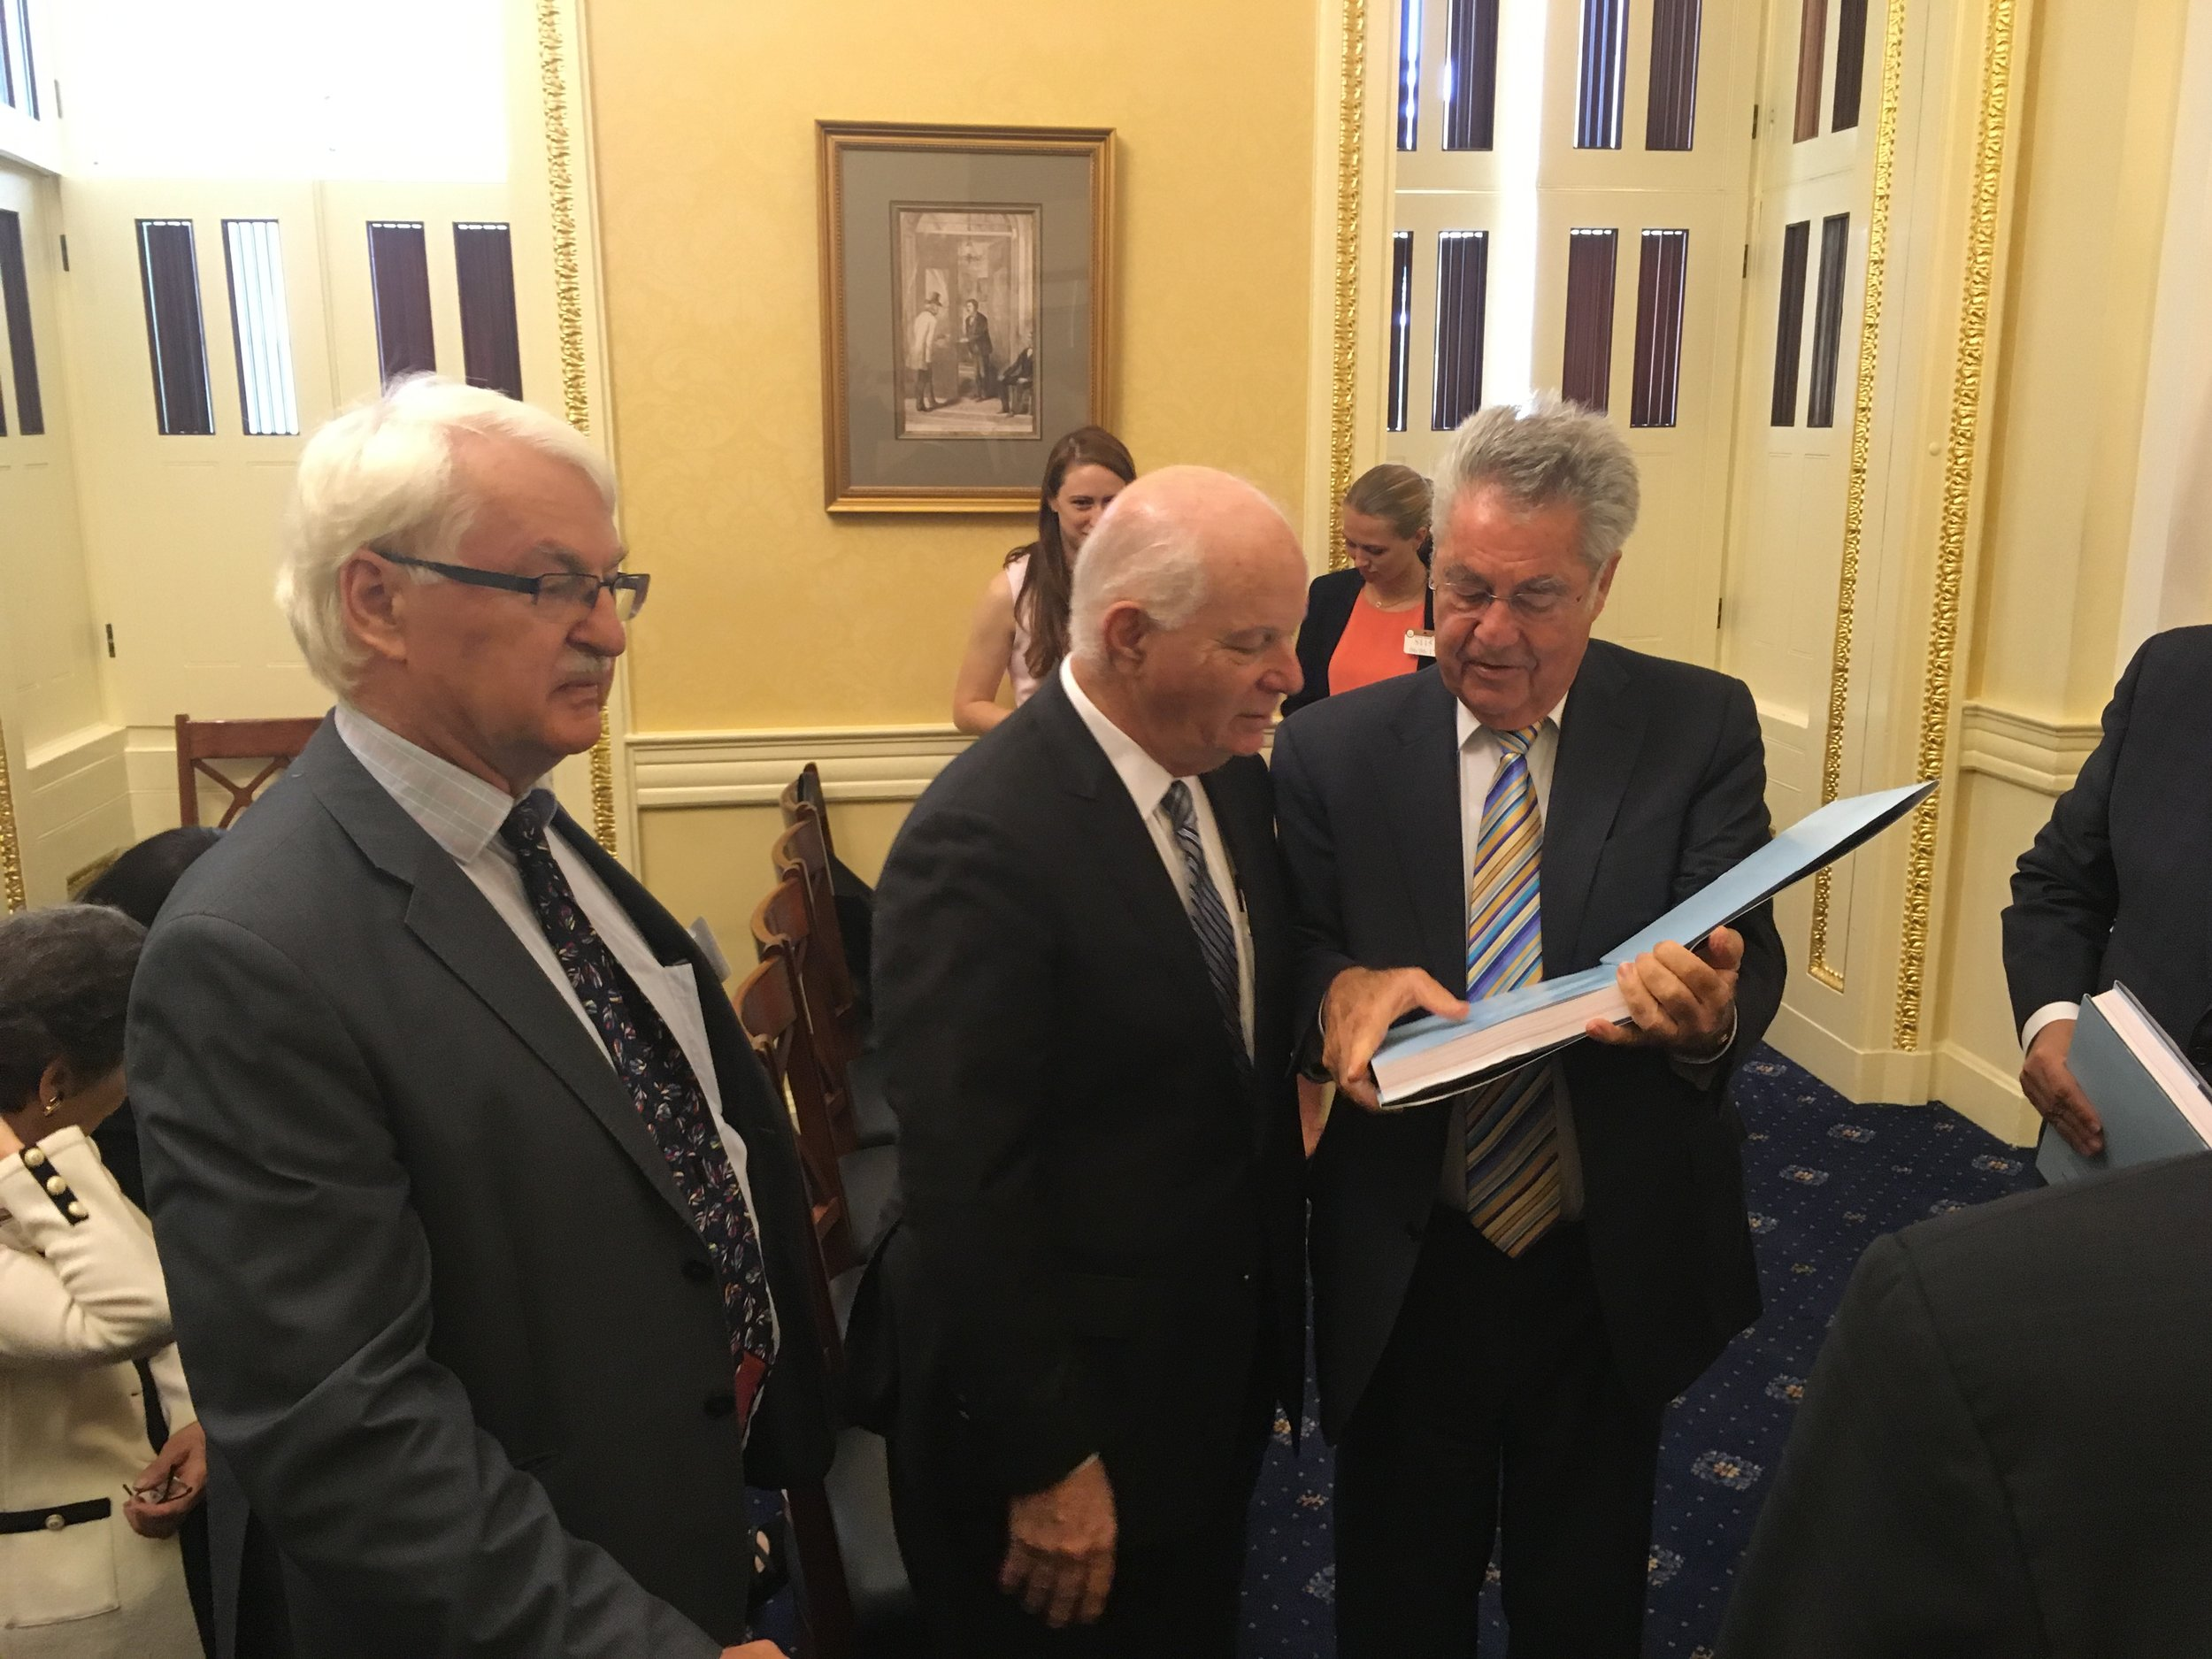 Senate Bischof Sen Cardin Pres Fischer.JPG